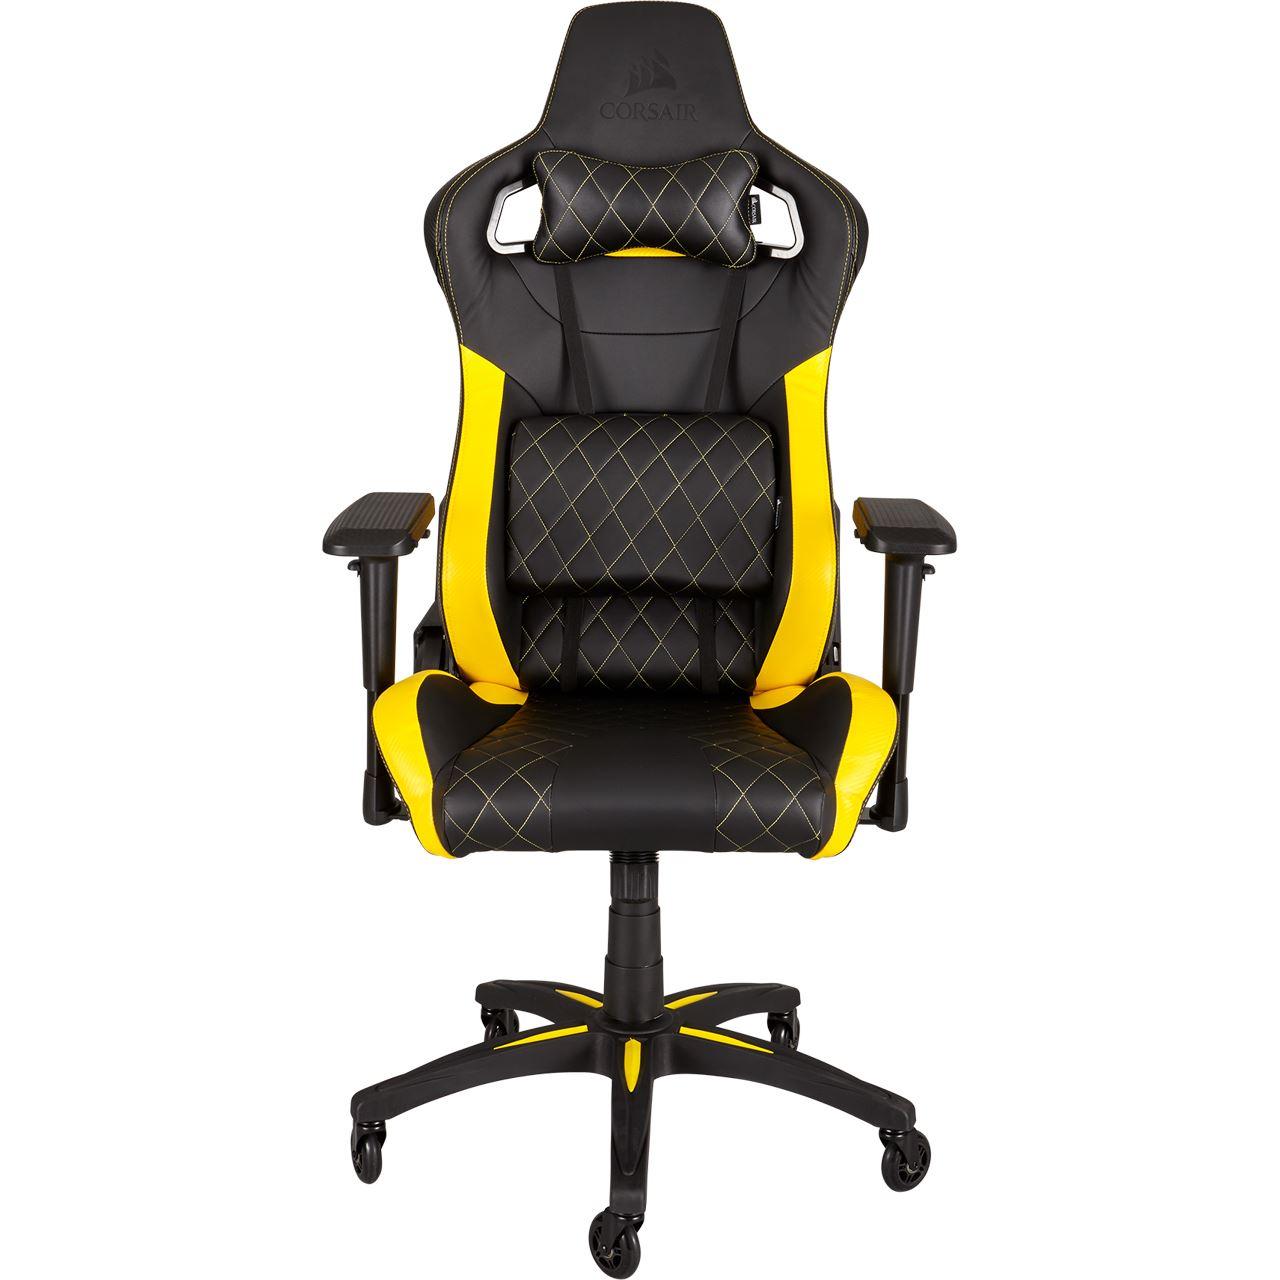 Corsair T1 Race Gaming Chair Schwarz Gelb Gaming Seats